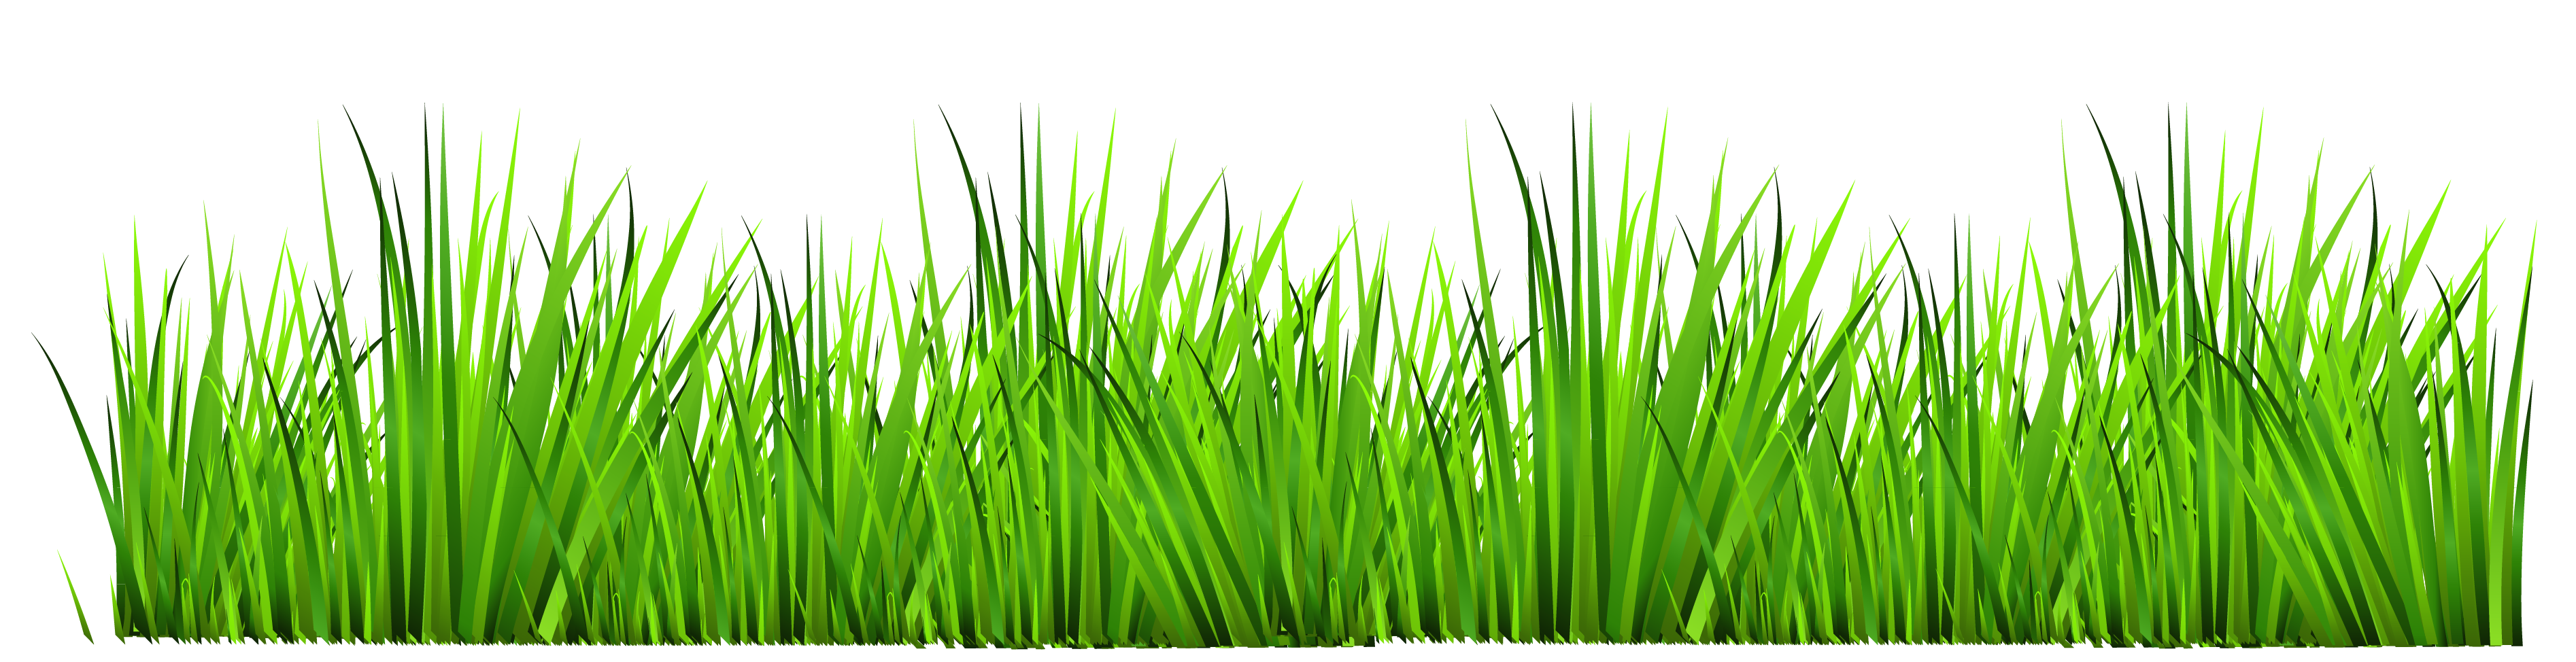 Grass decor clipart 0